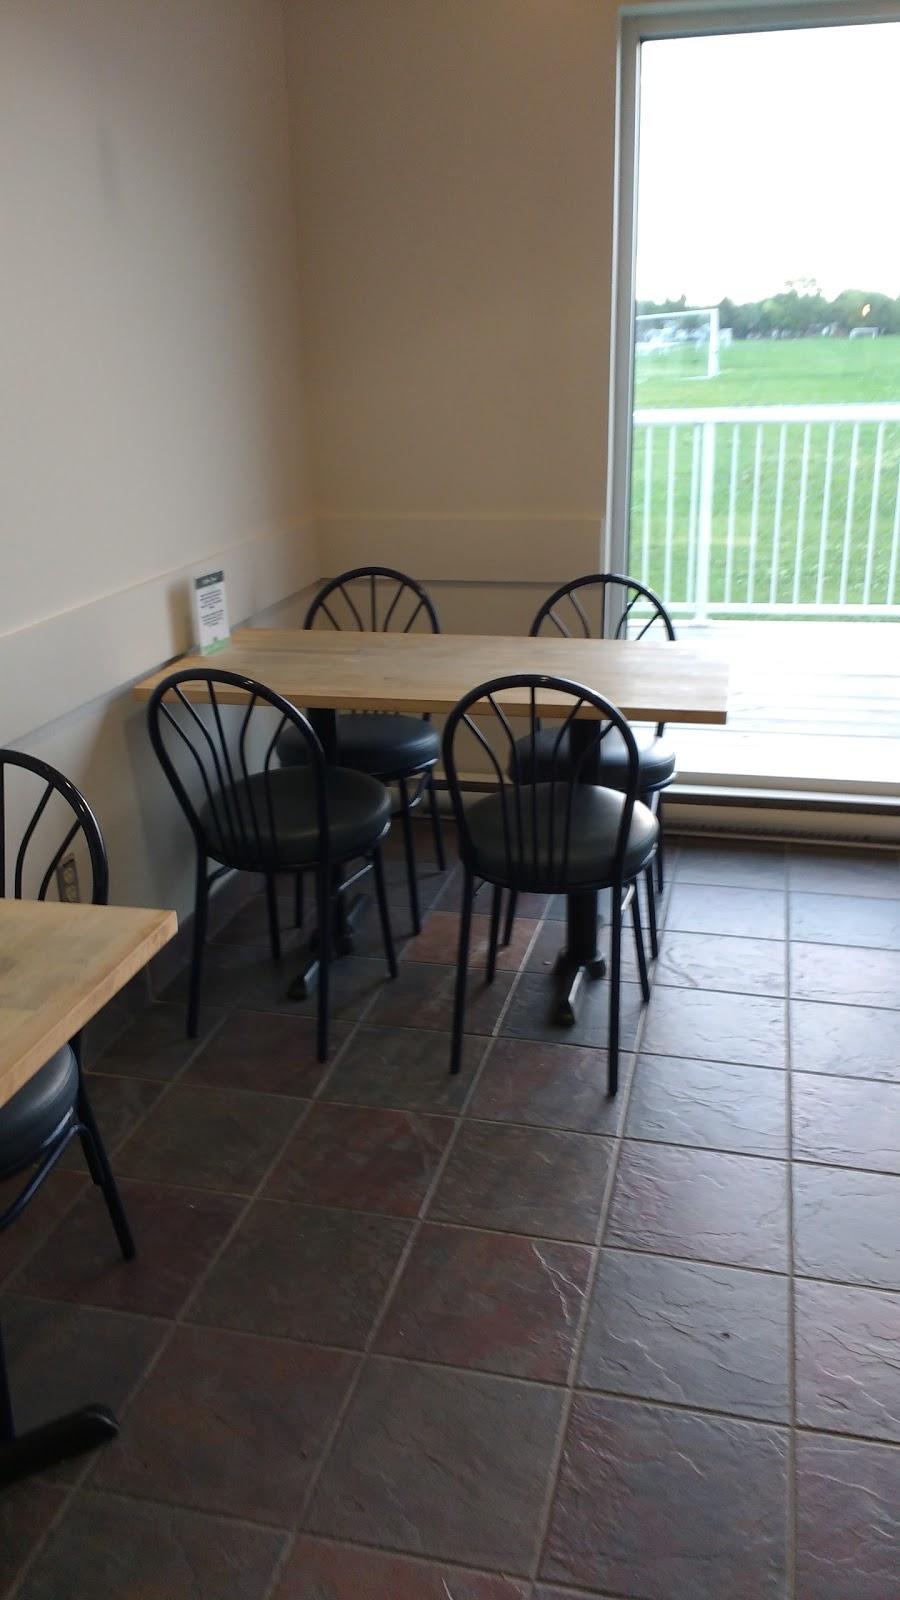 Bone Appetit Cafe   store   75 Poseidon Bay, Winnipeg, MB R3M 3E4, Canada   2049272631 OR +1 204-927-2631